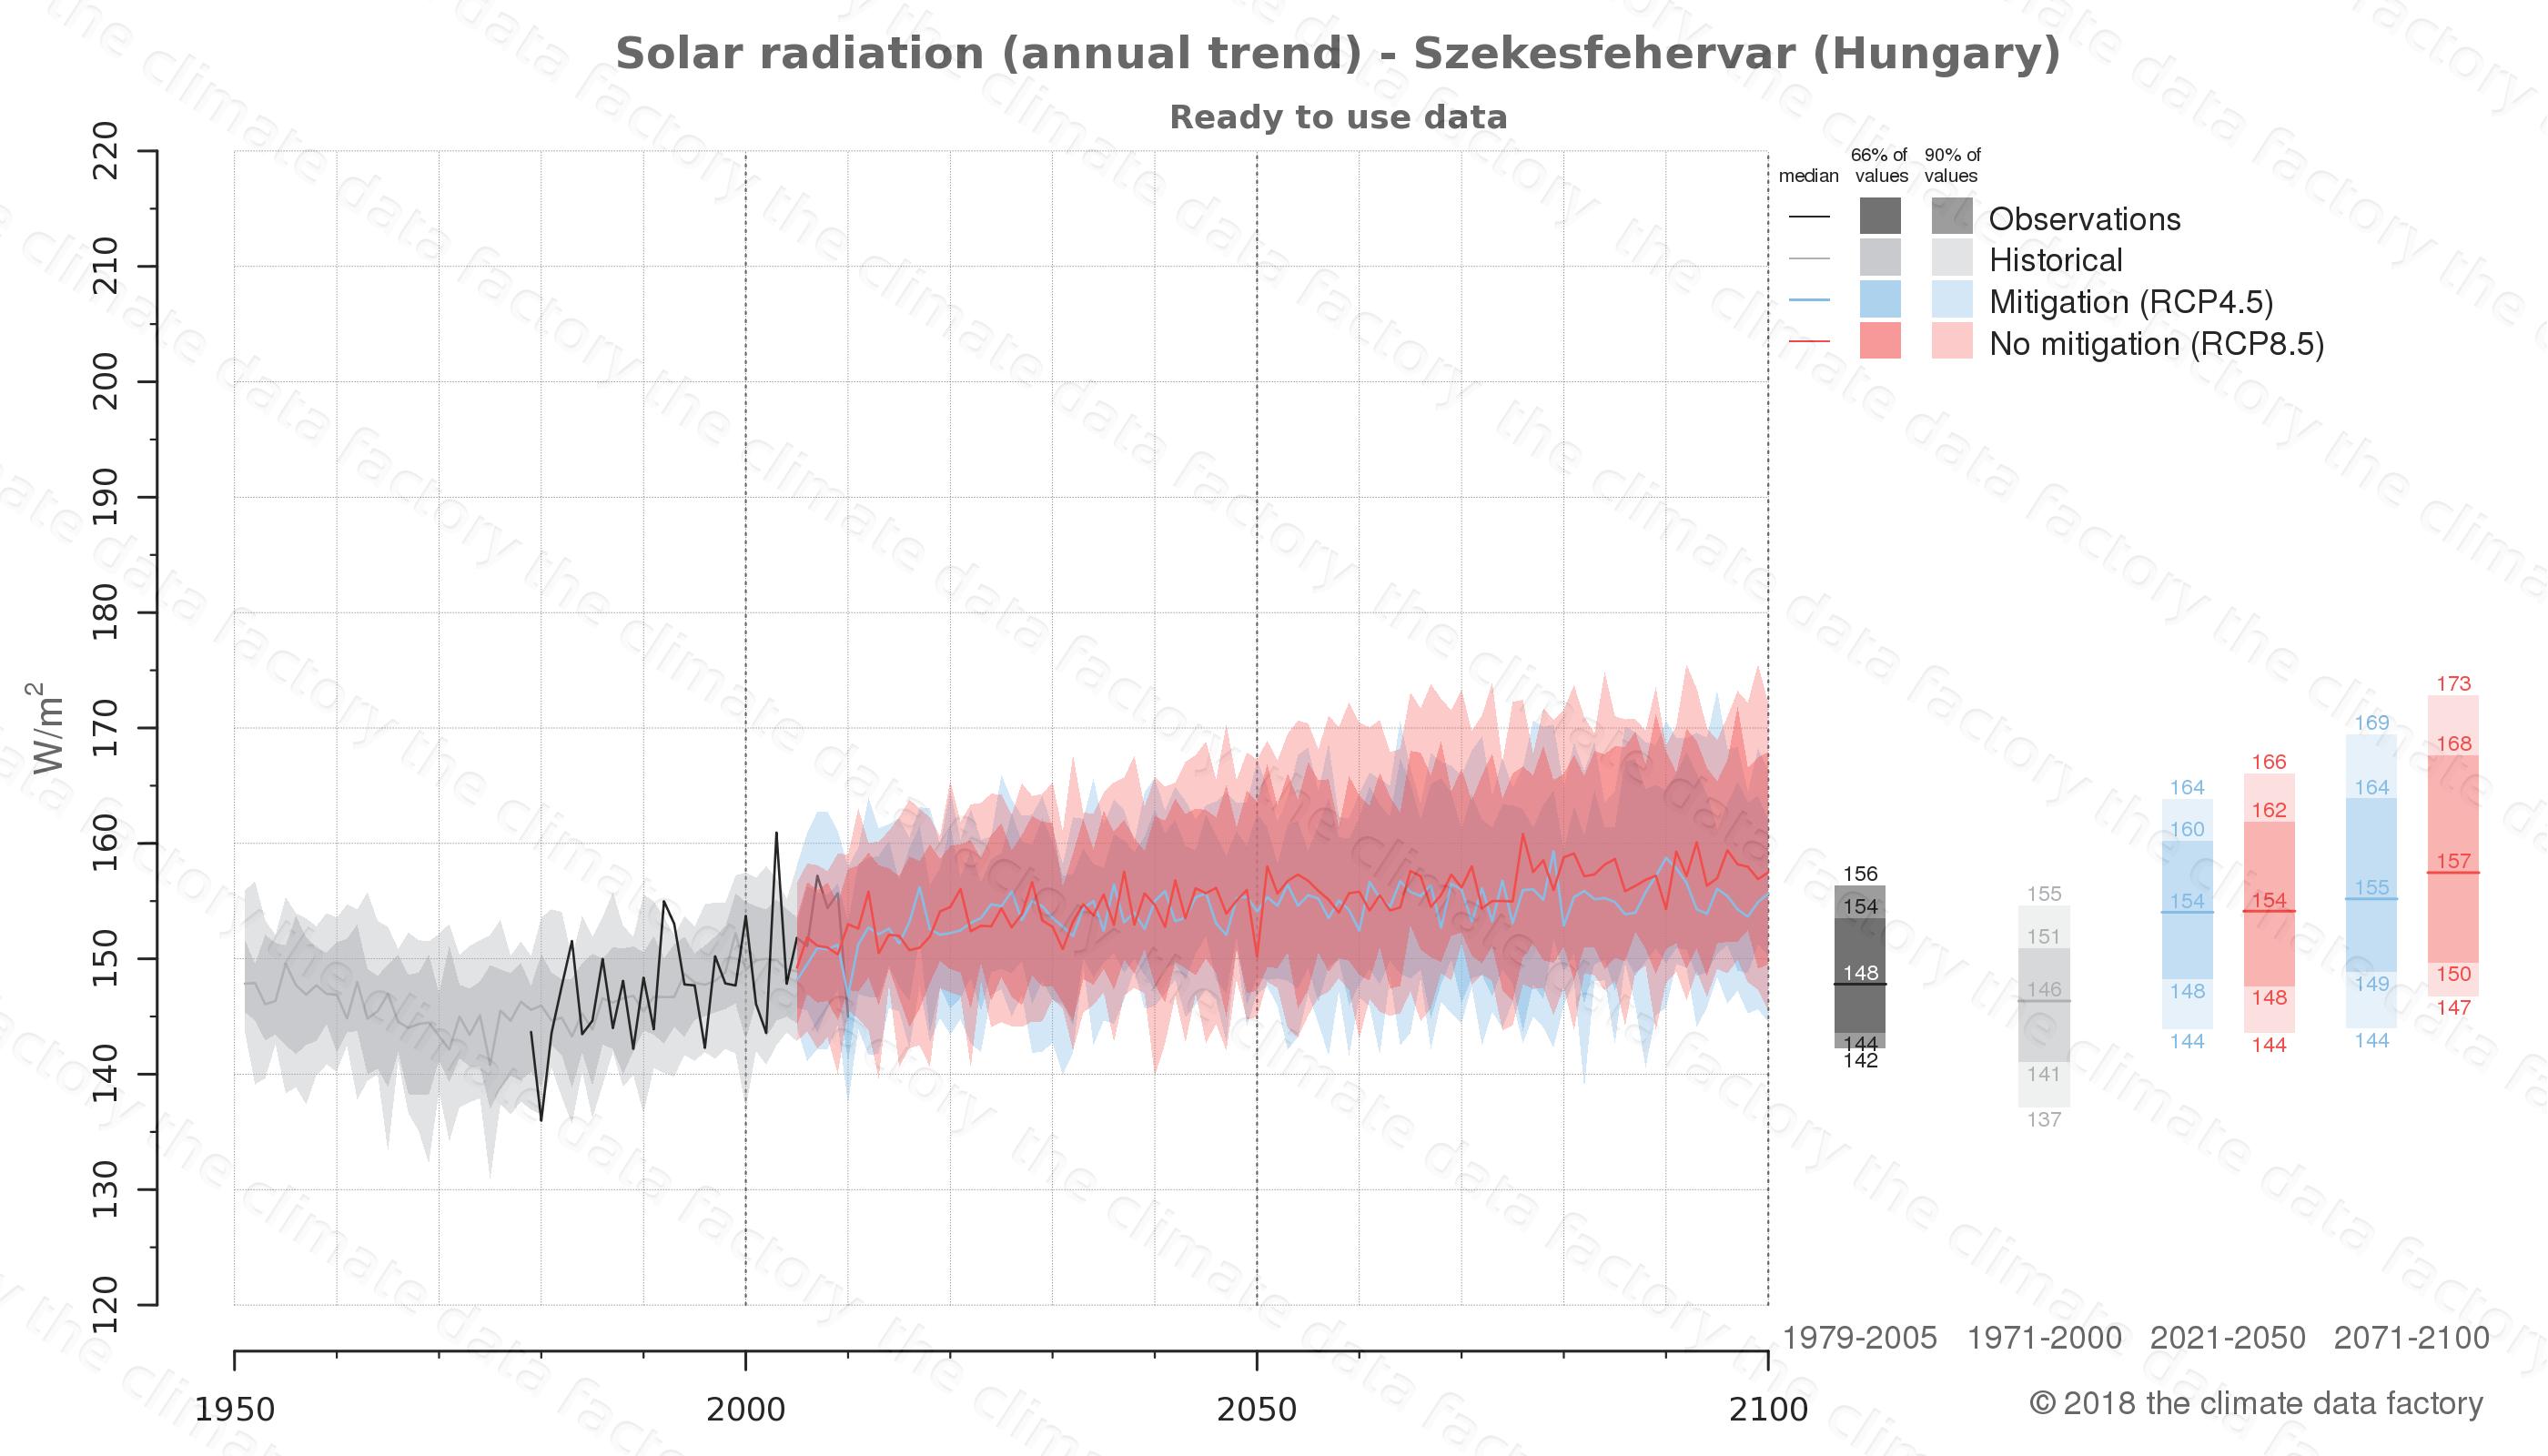 climate change data policy adaptation climate graph city data solar-radiation szekesfehervar hungary